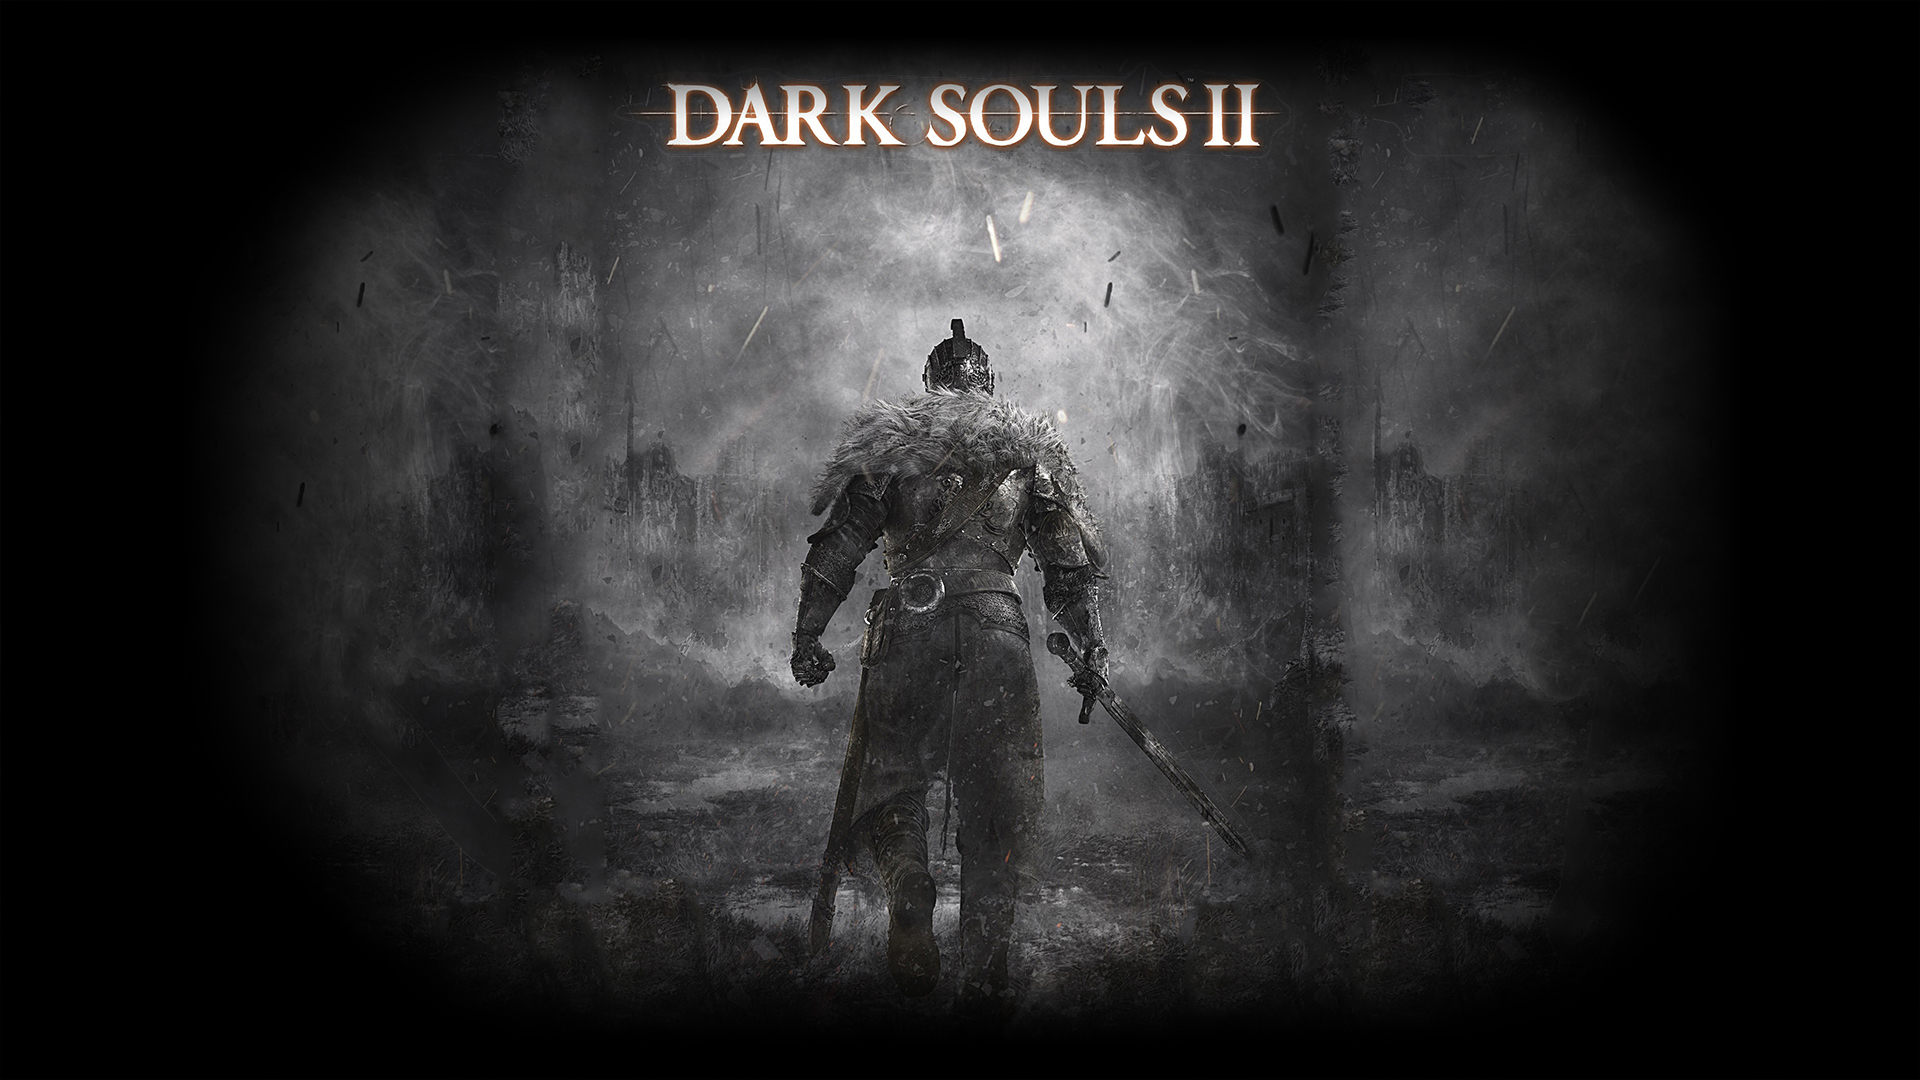 dark souls 2 II game knight hd wallpaper image picture photo 1920x1080